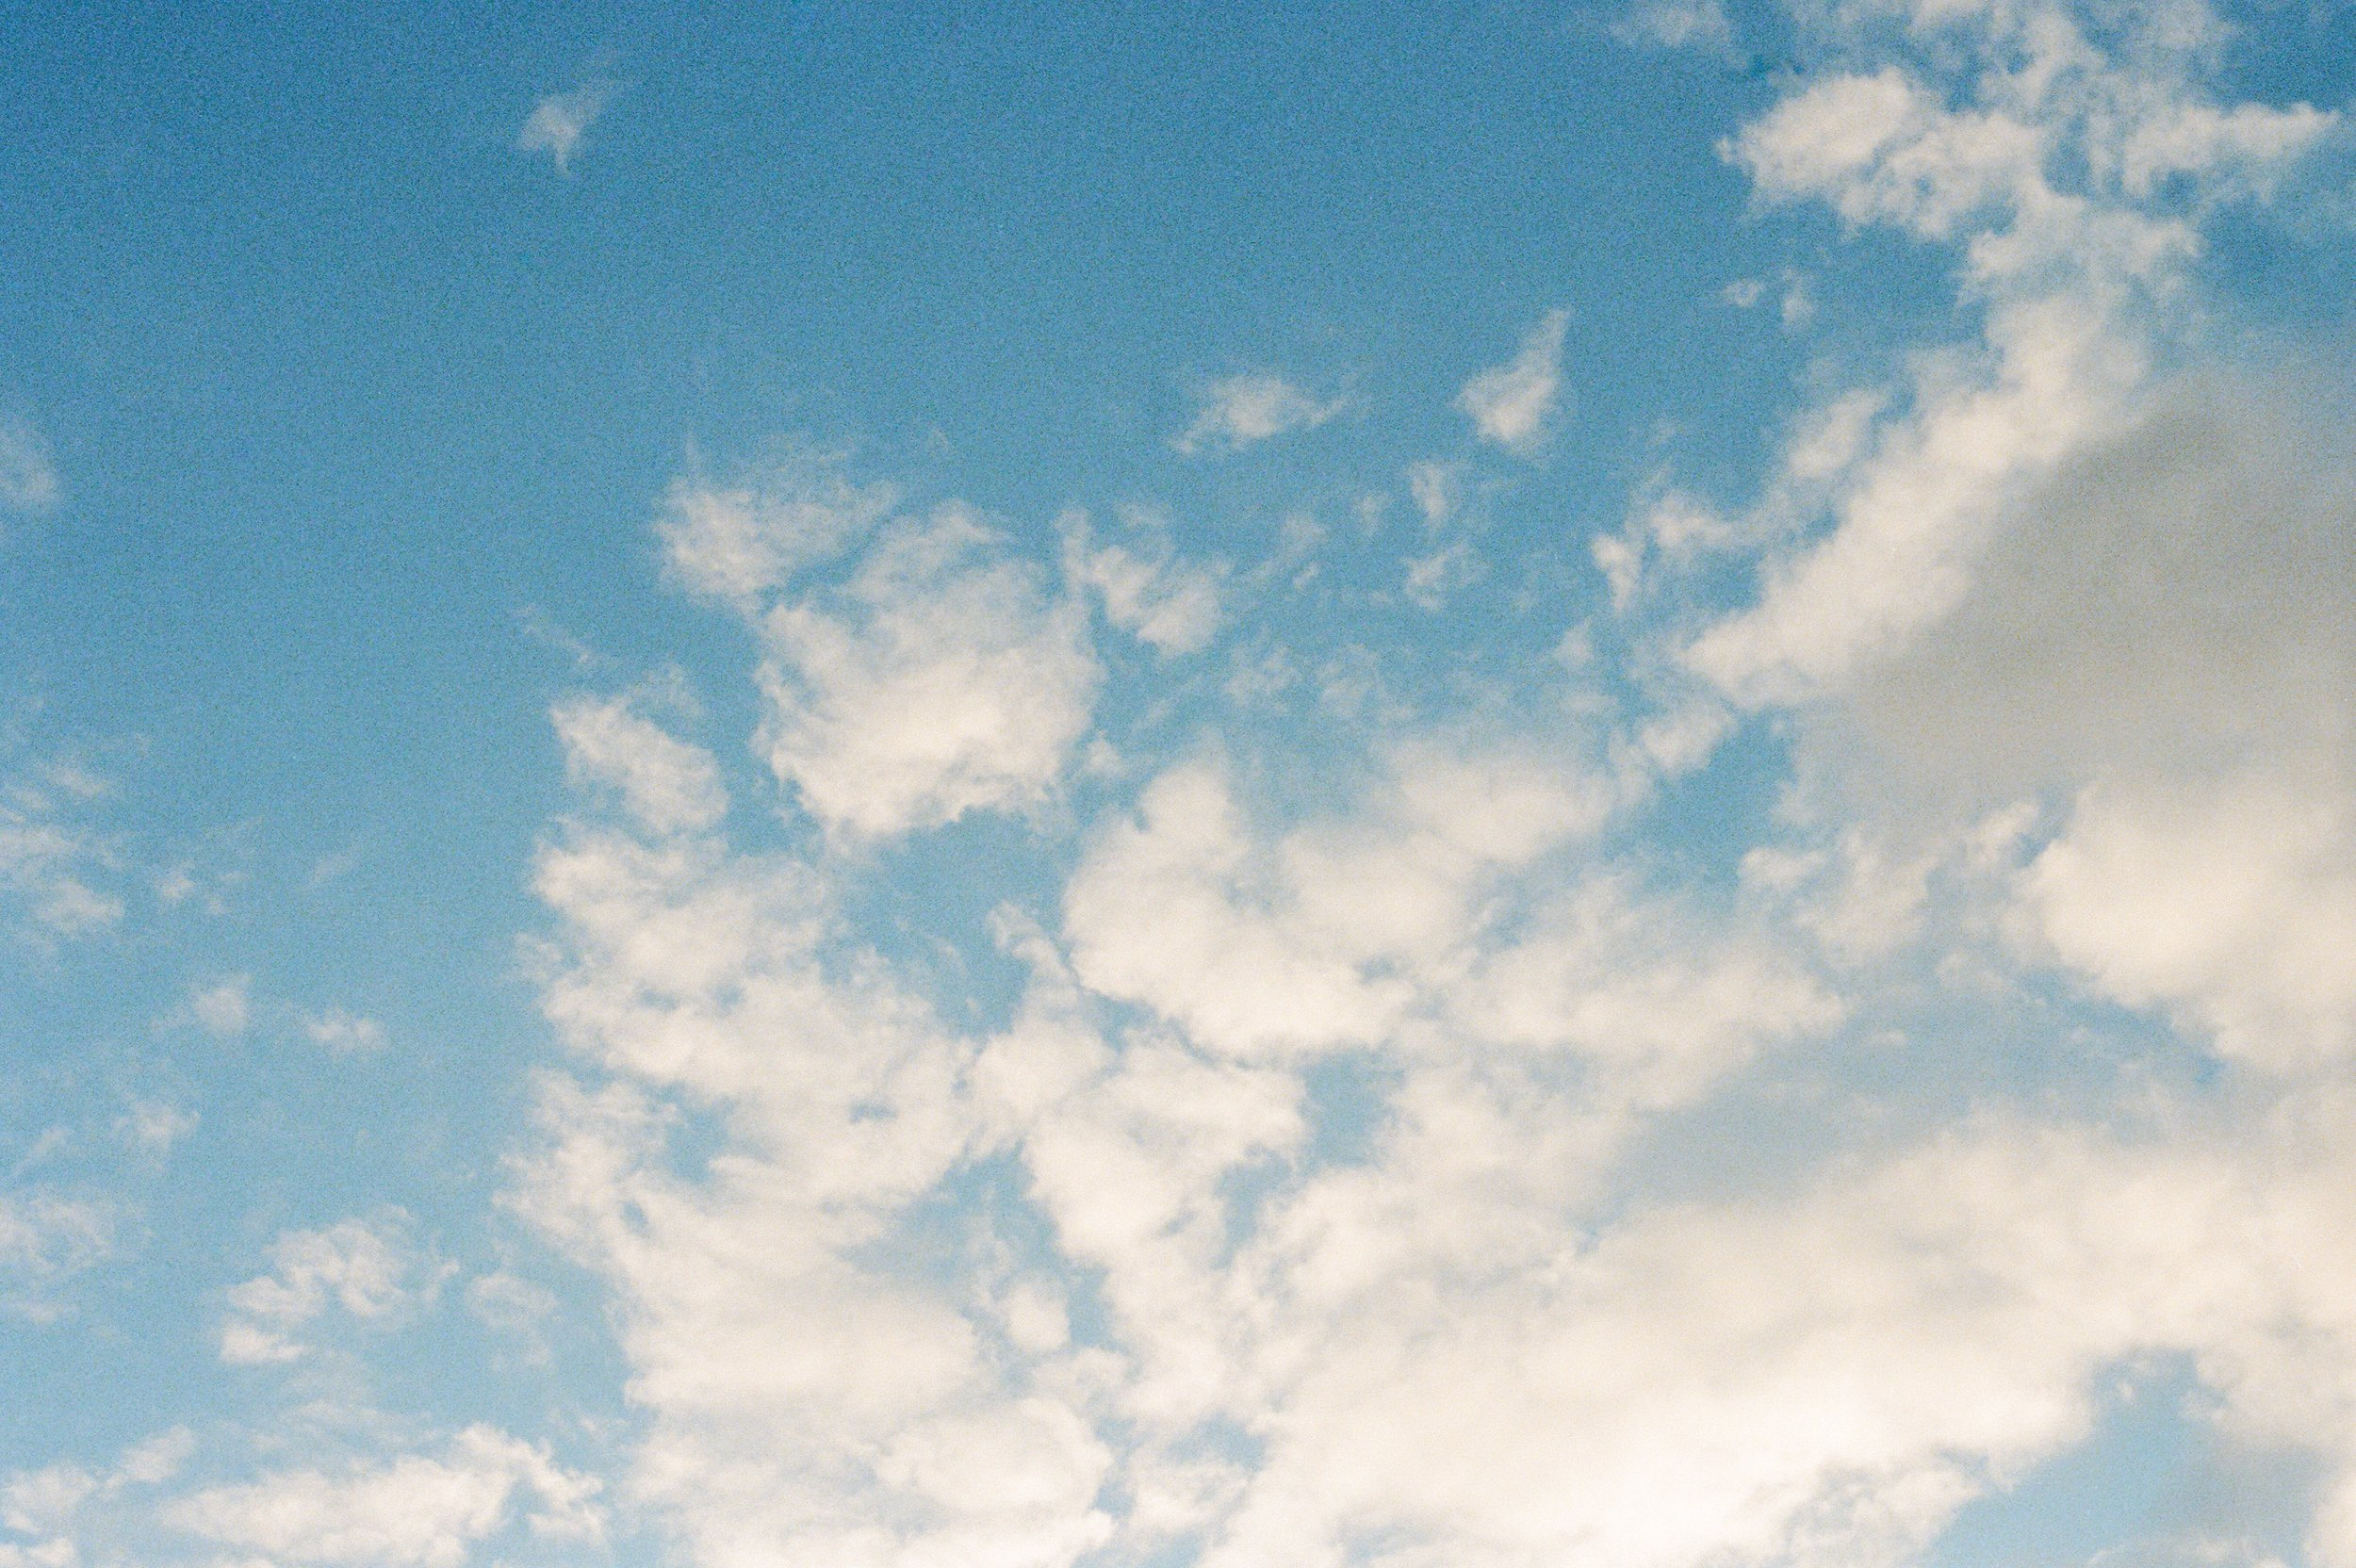 clouds_cloud_film_photographer_emily_walker_3.jpg